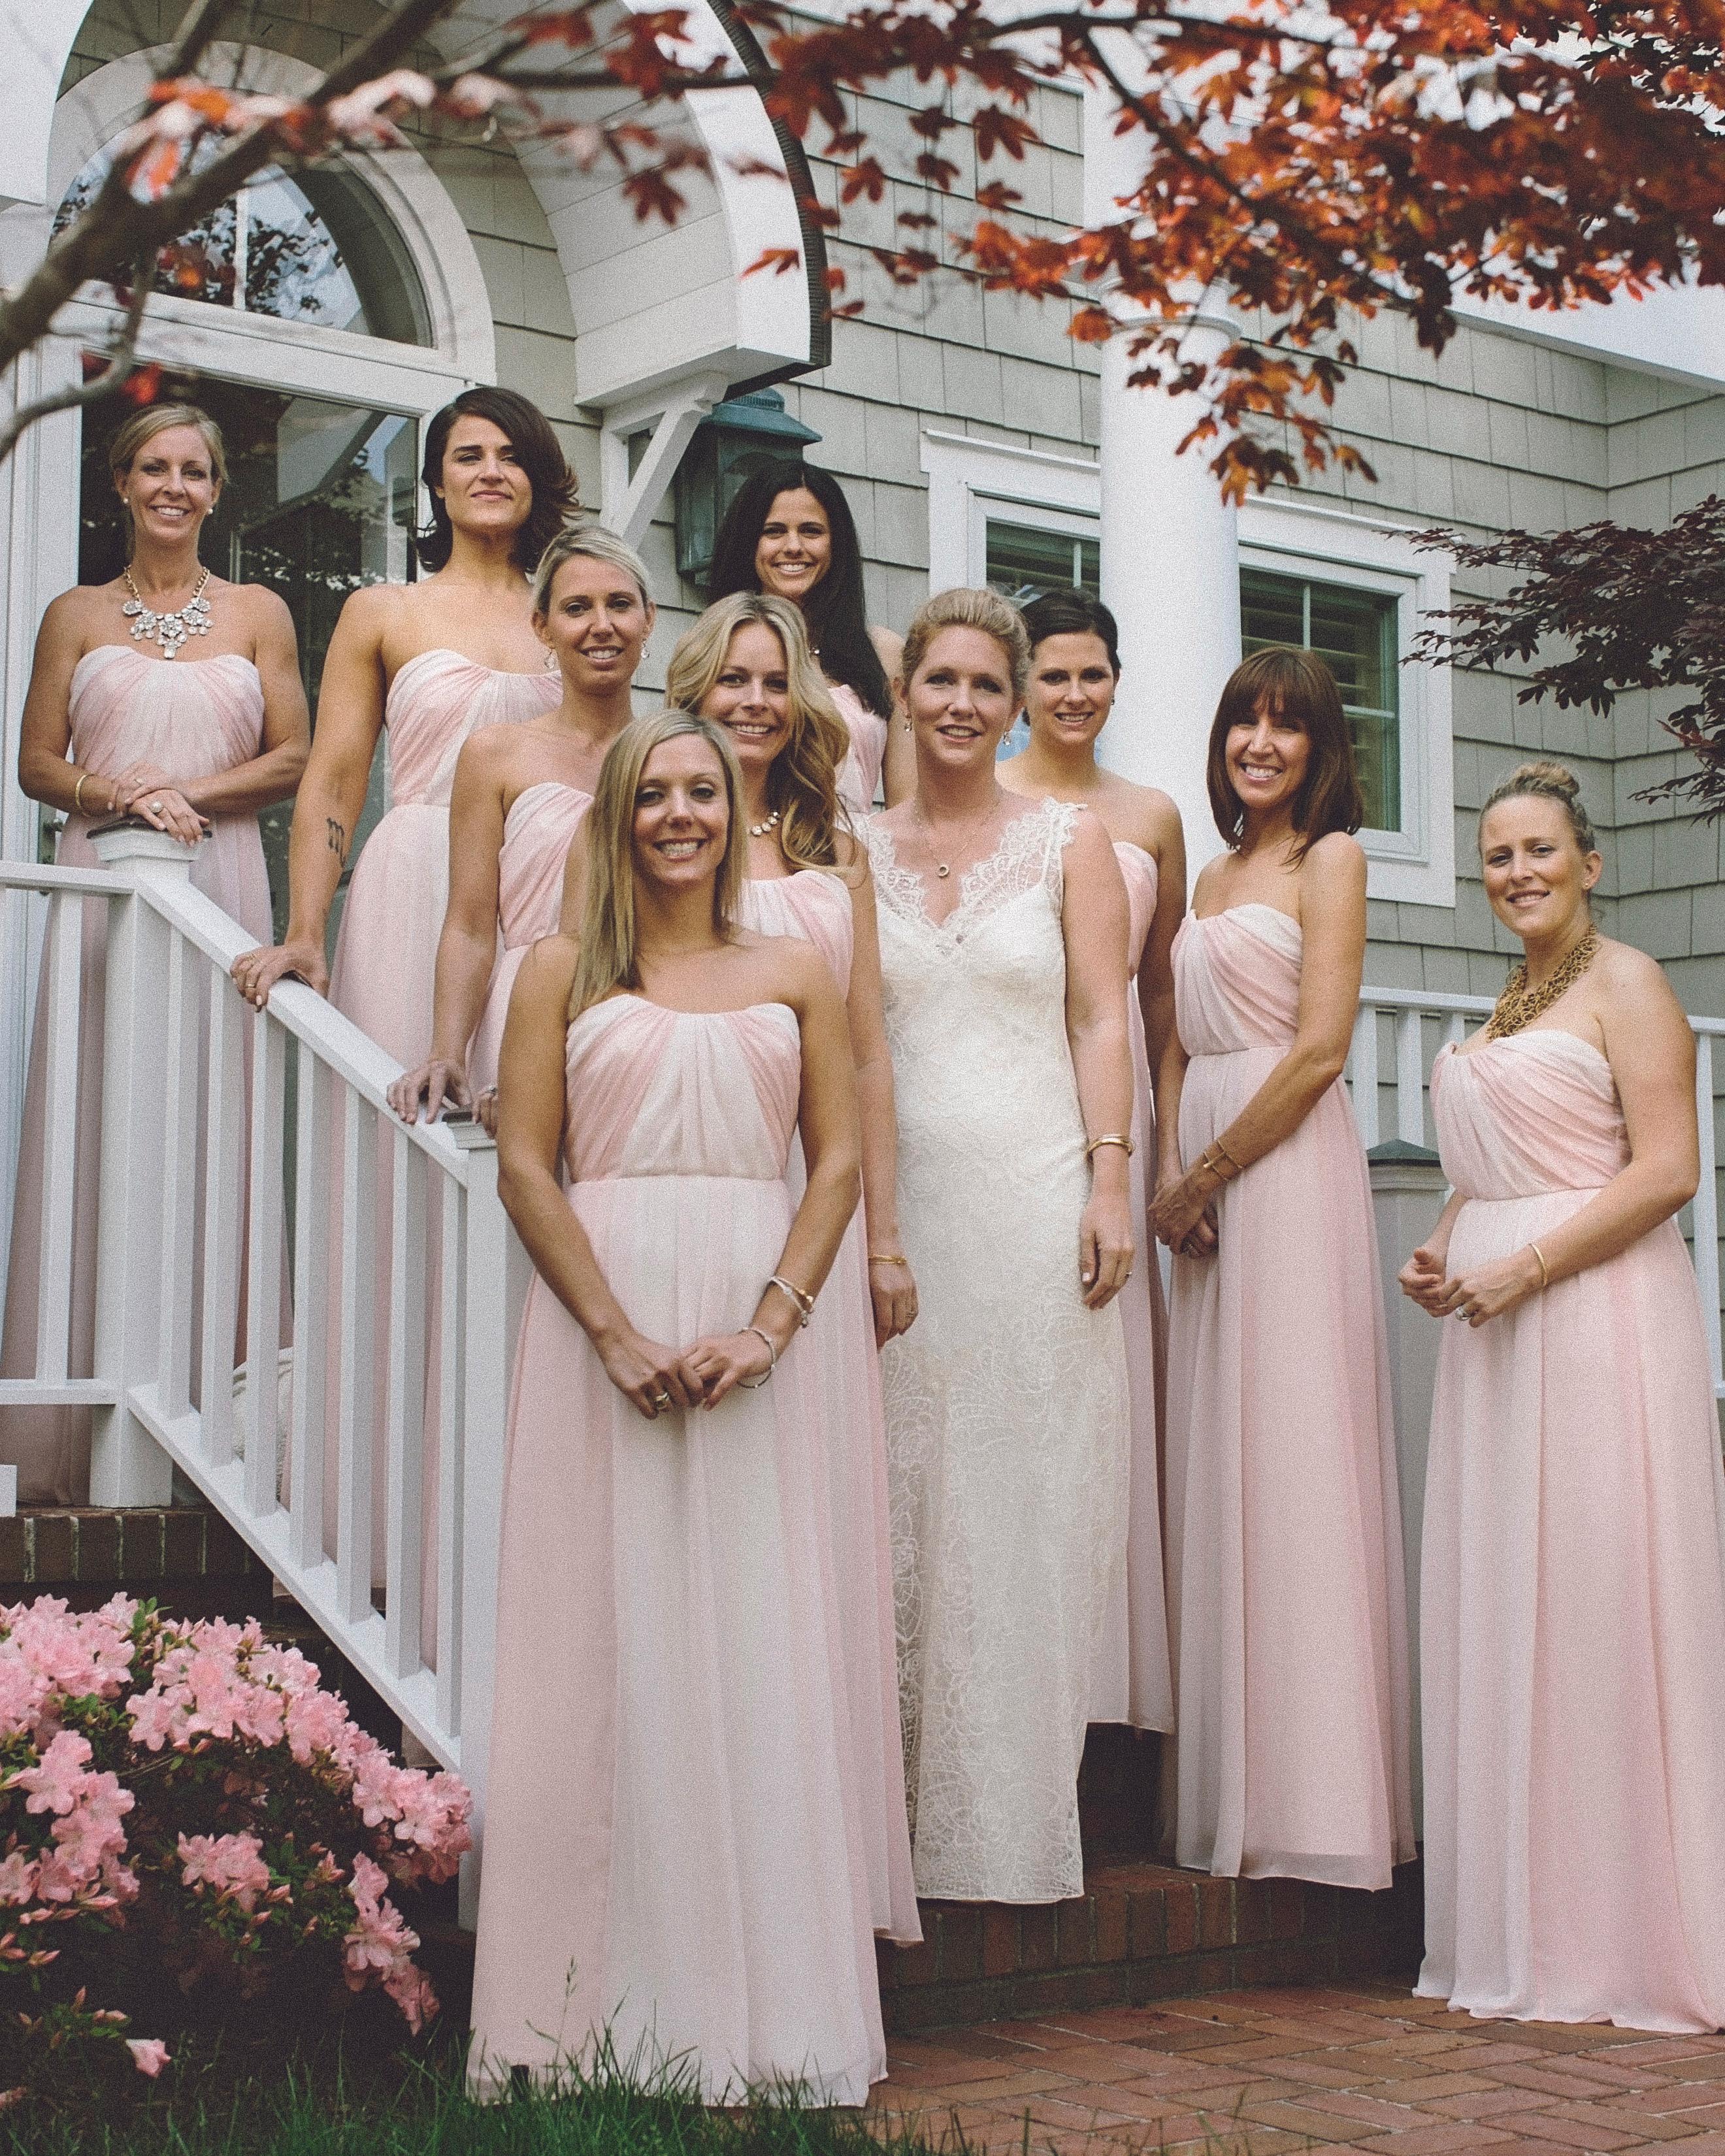 molly-greg-wedding-bmaids-00020-s111481-0814.jpg